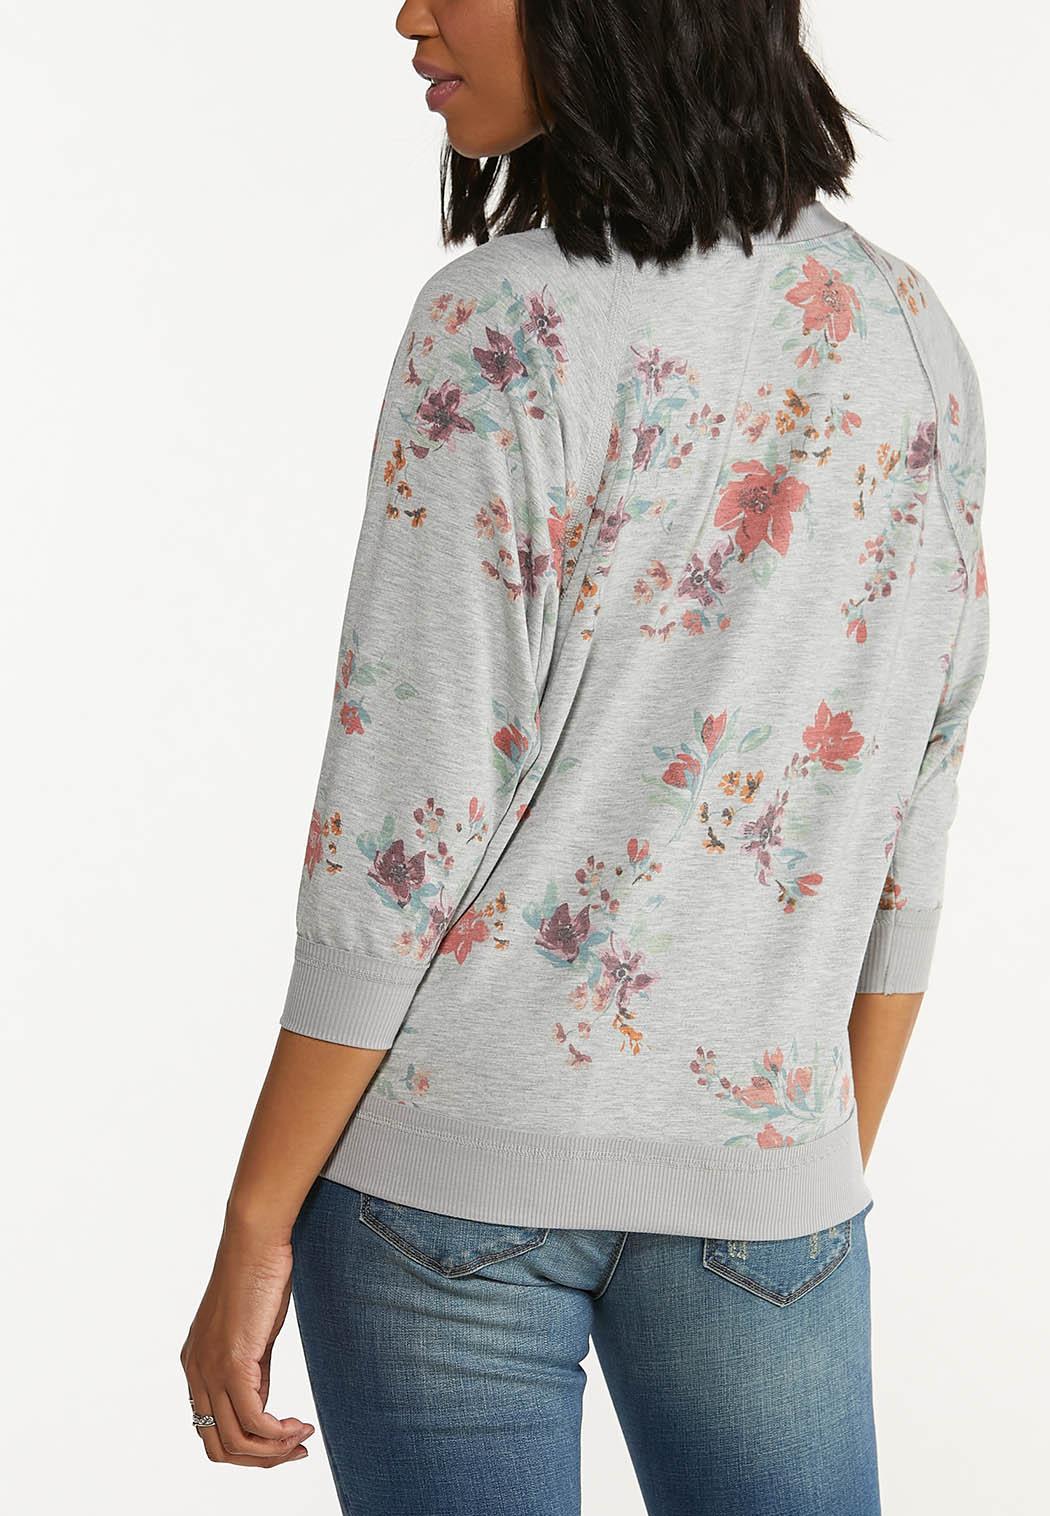 Plus Size Gray Floral Sweatshirt (Item #44590216)